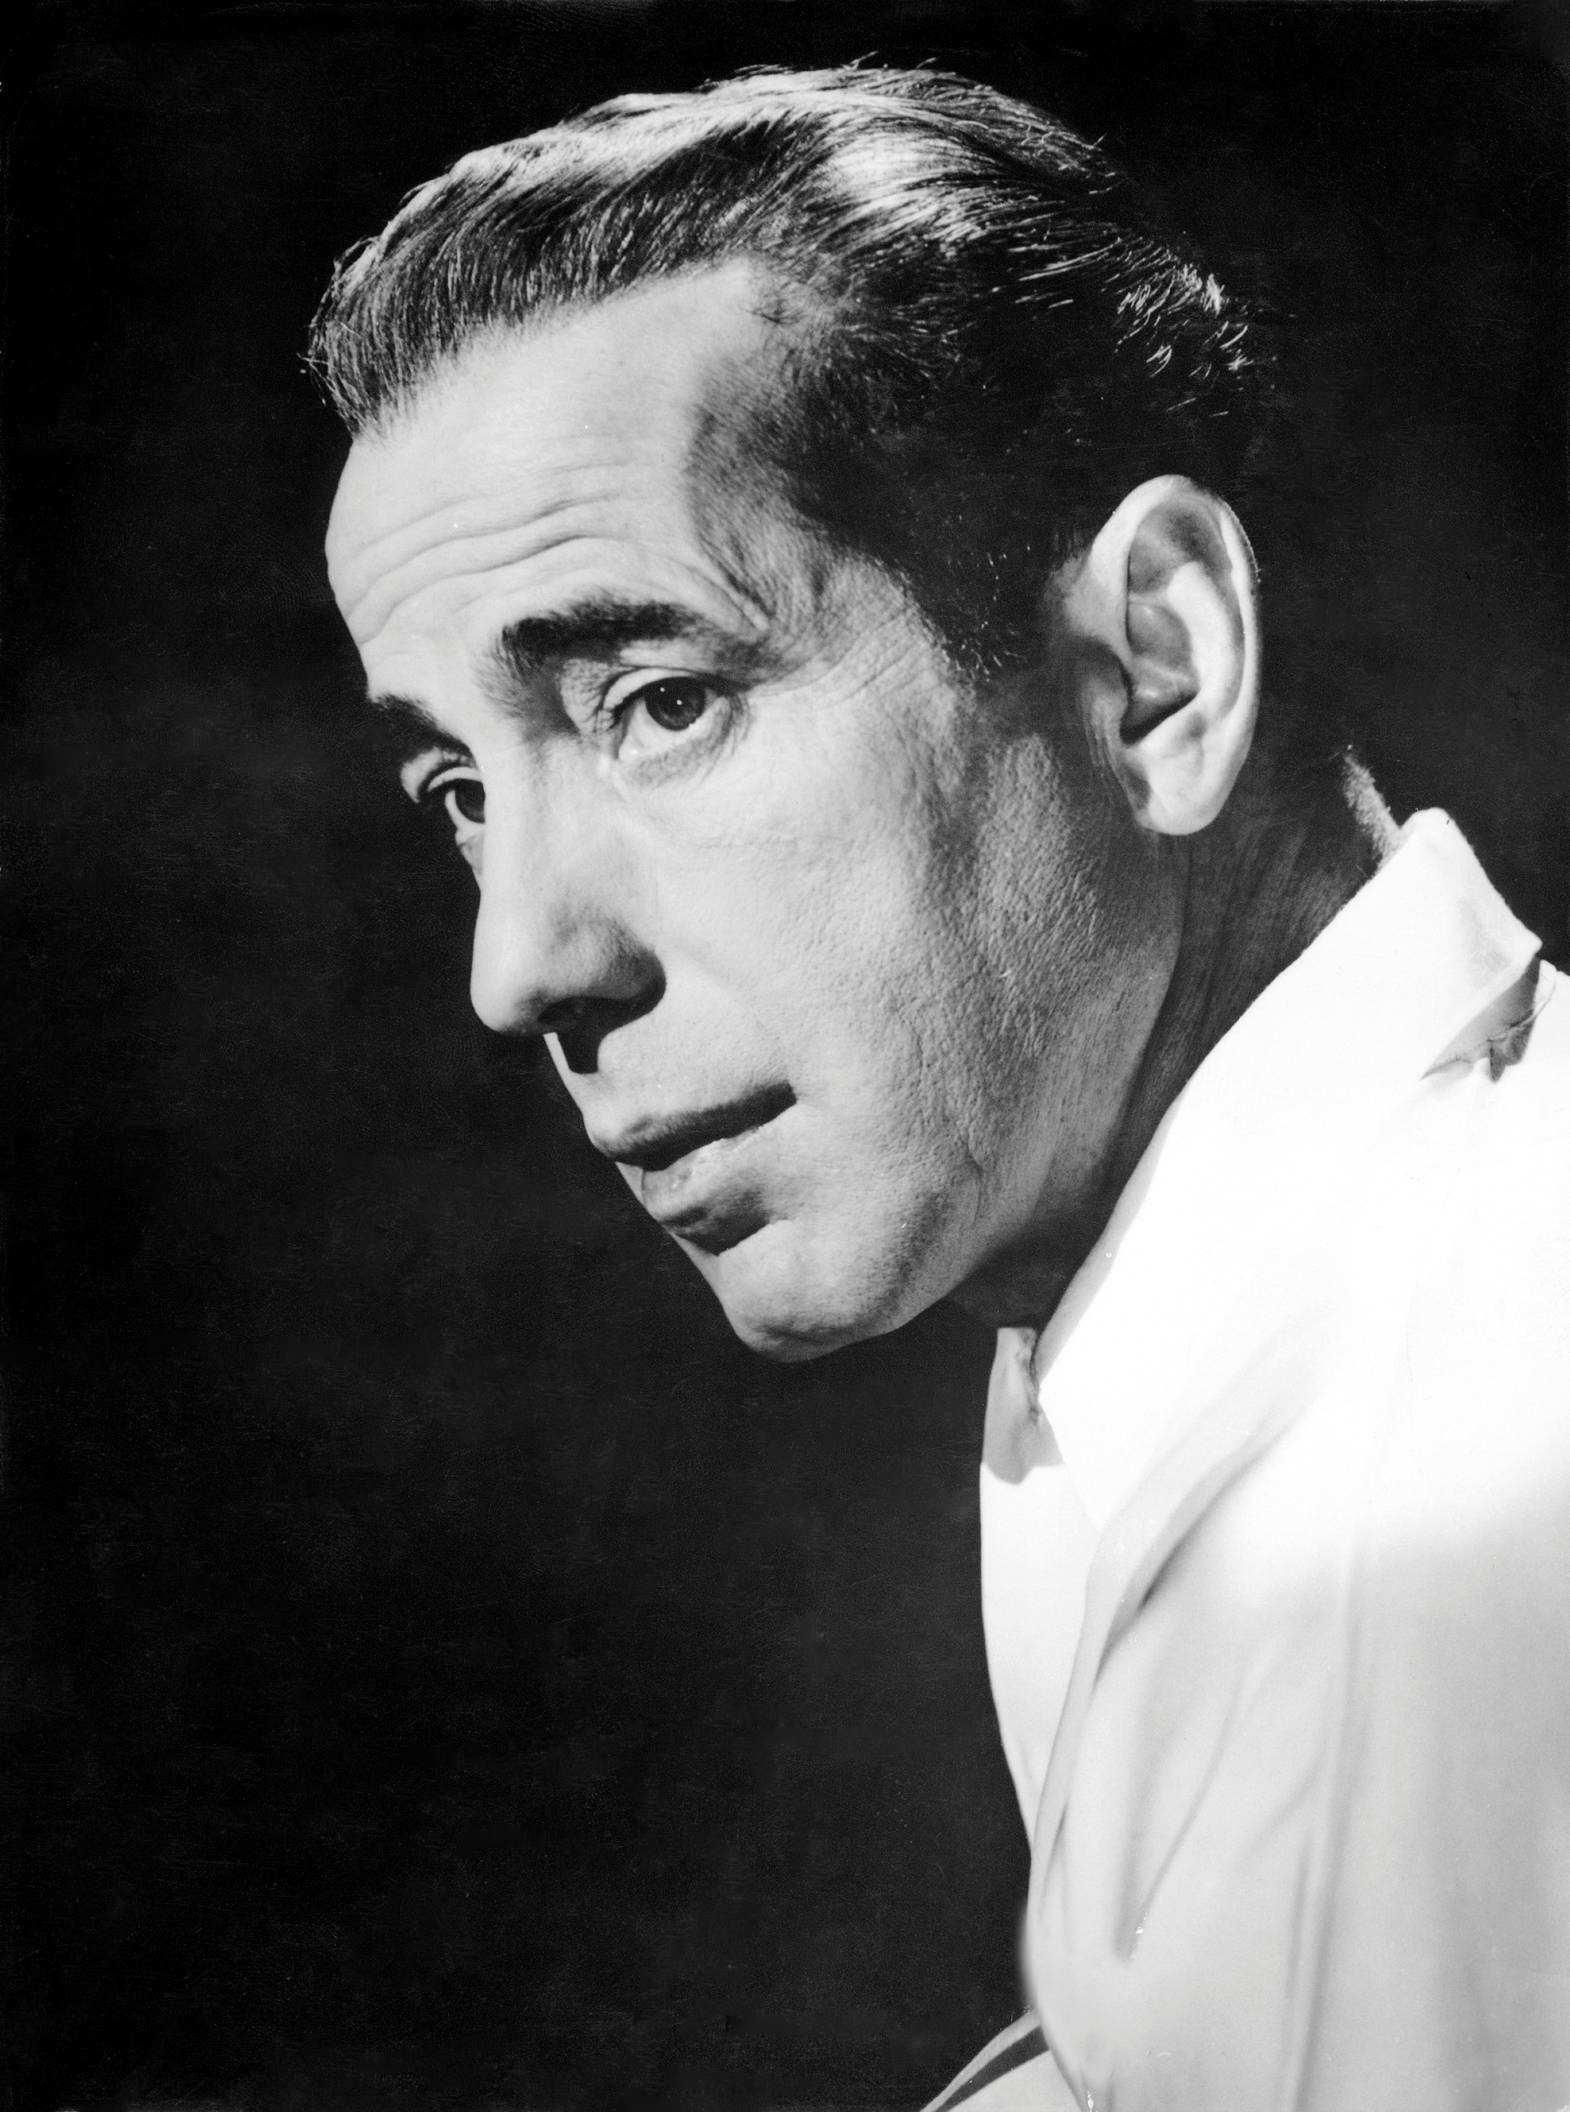 Humphrey Bogart 1899 1957 Filmonogamy